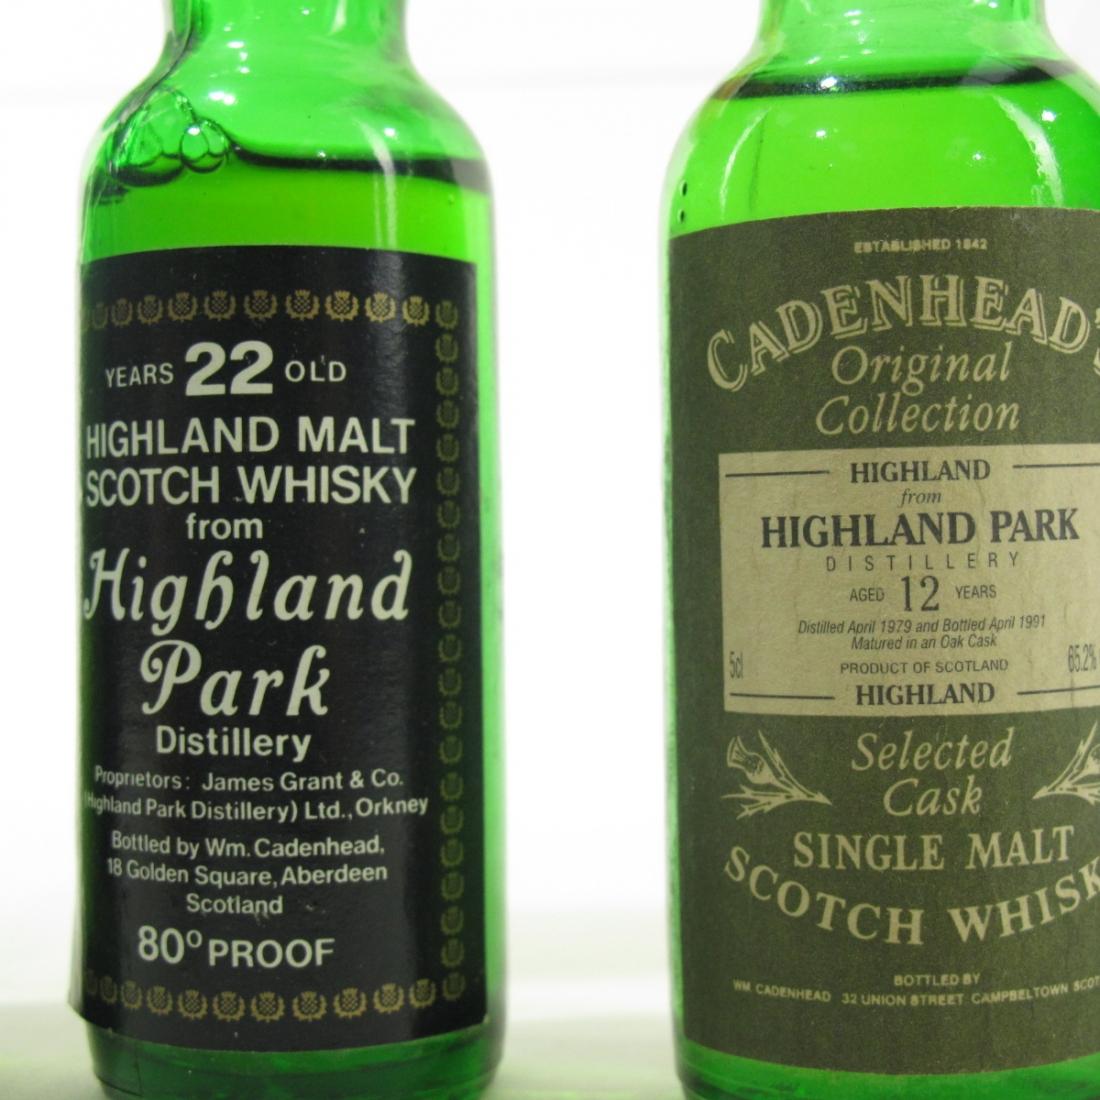 Highland Park Cadenhead's Miniatures x 6